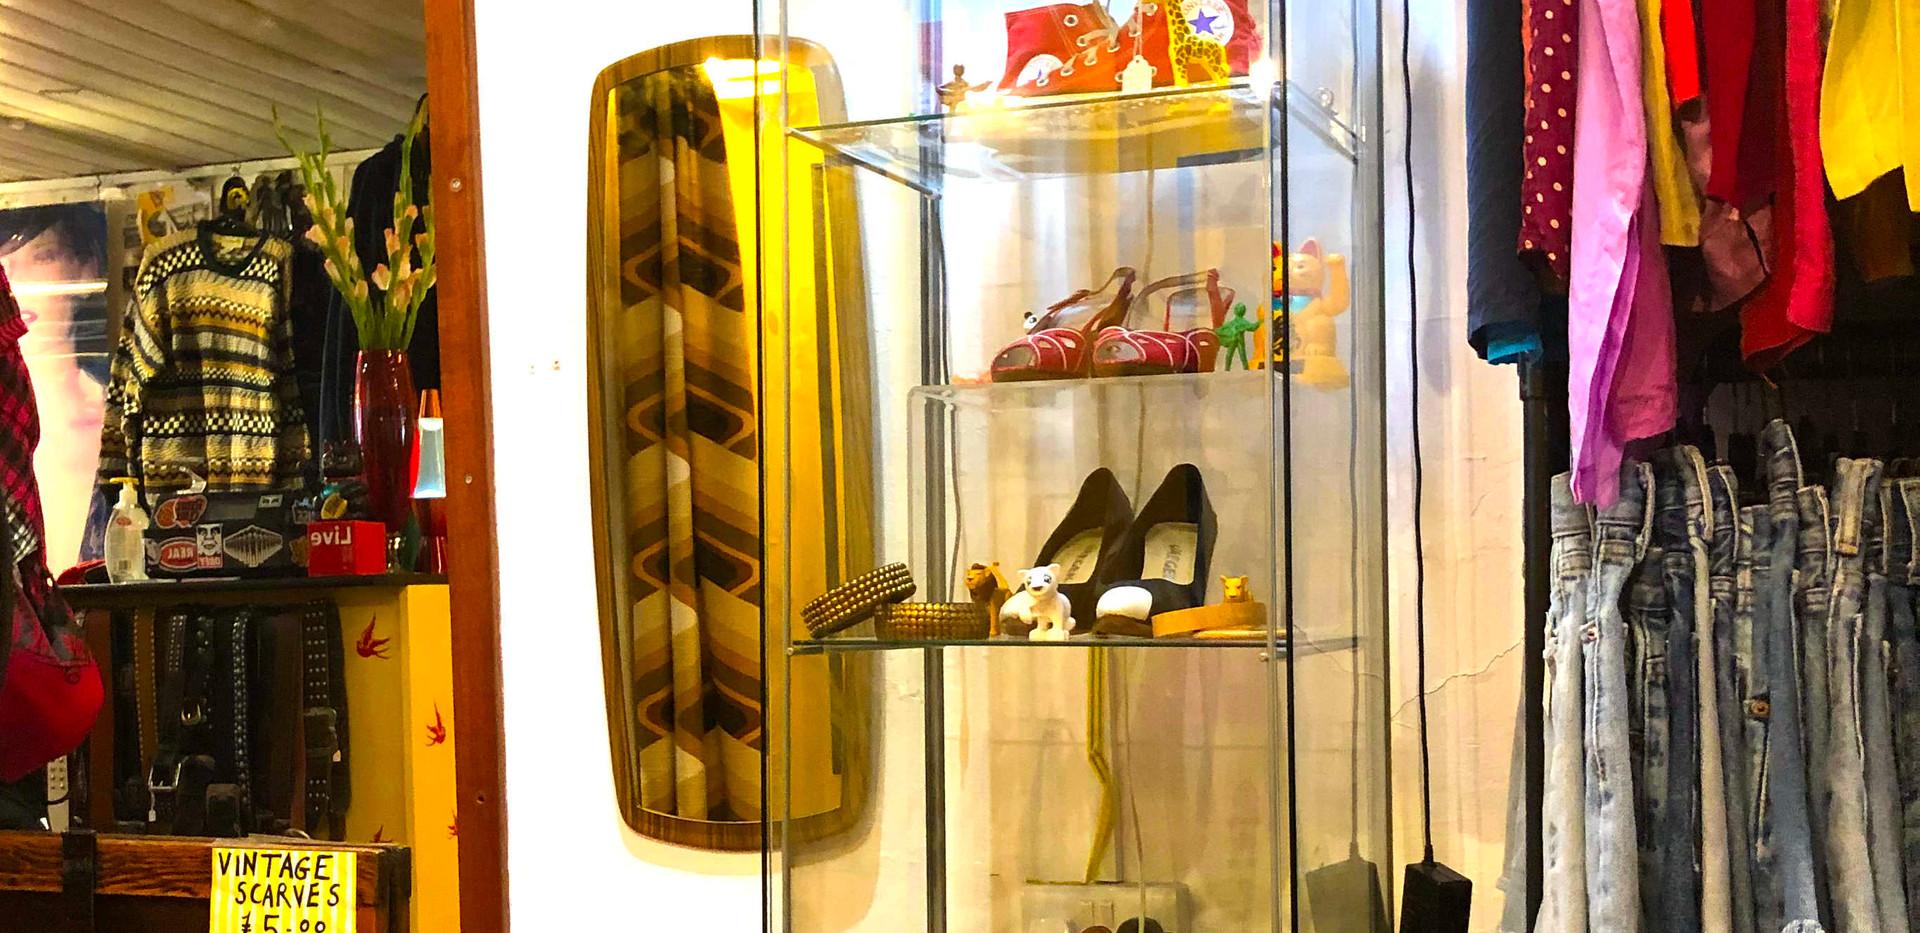 The Yellow Shop 3452.jpg